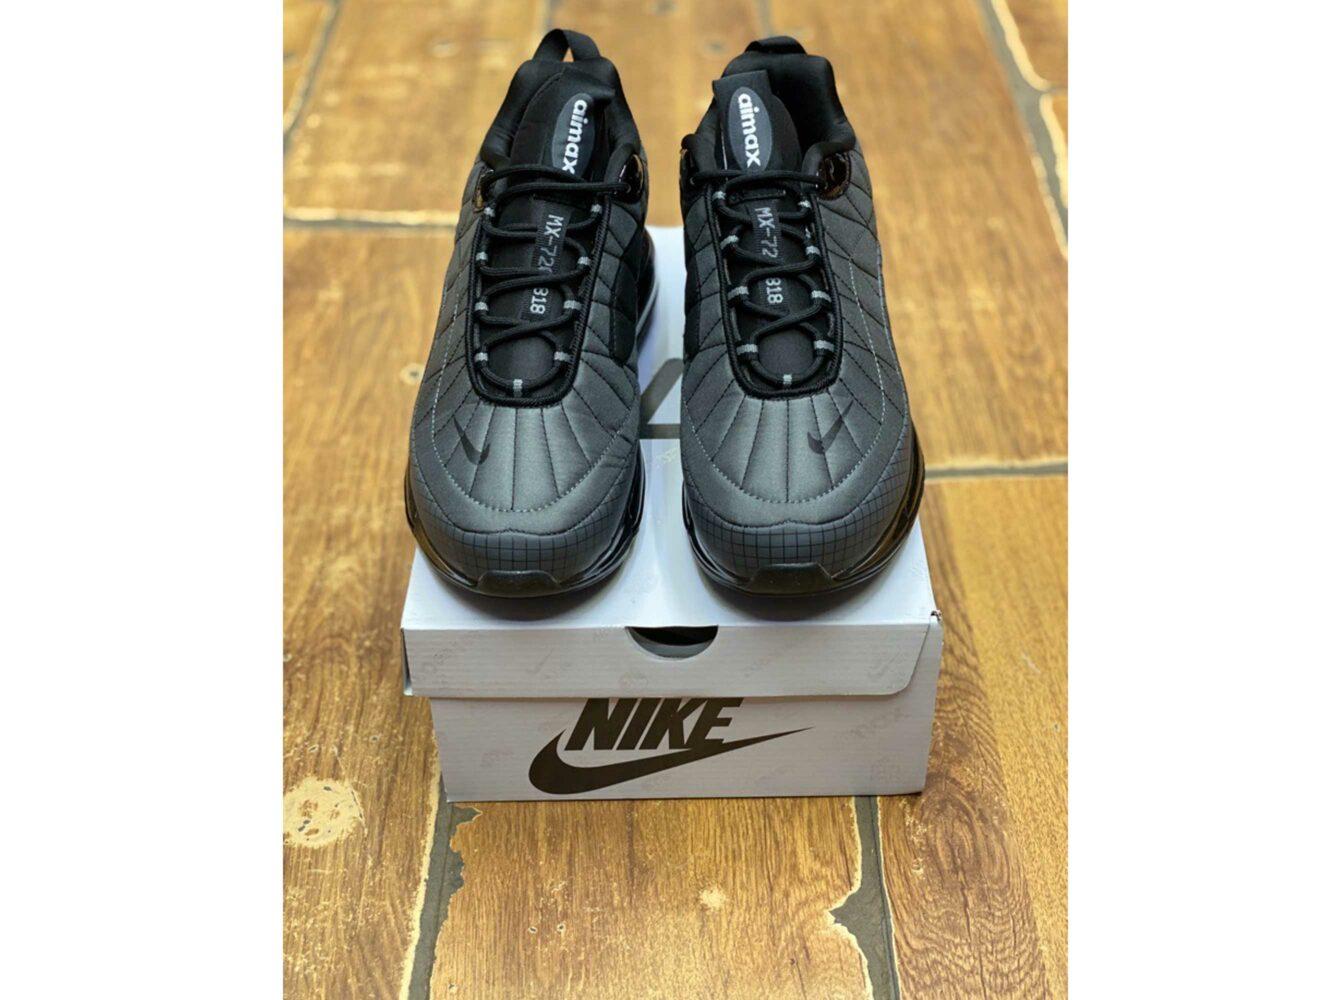 nike air max 720-818 grey купить